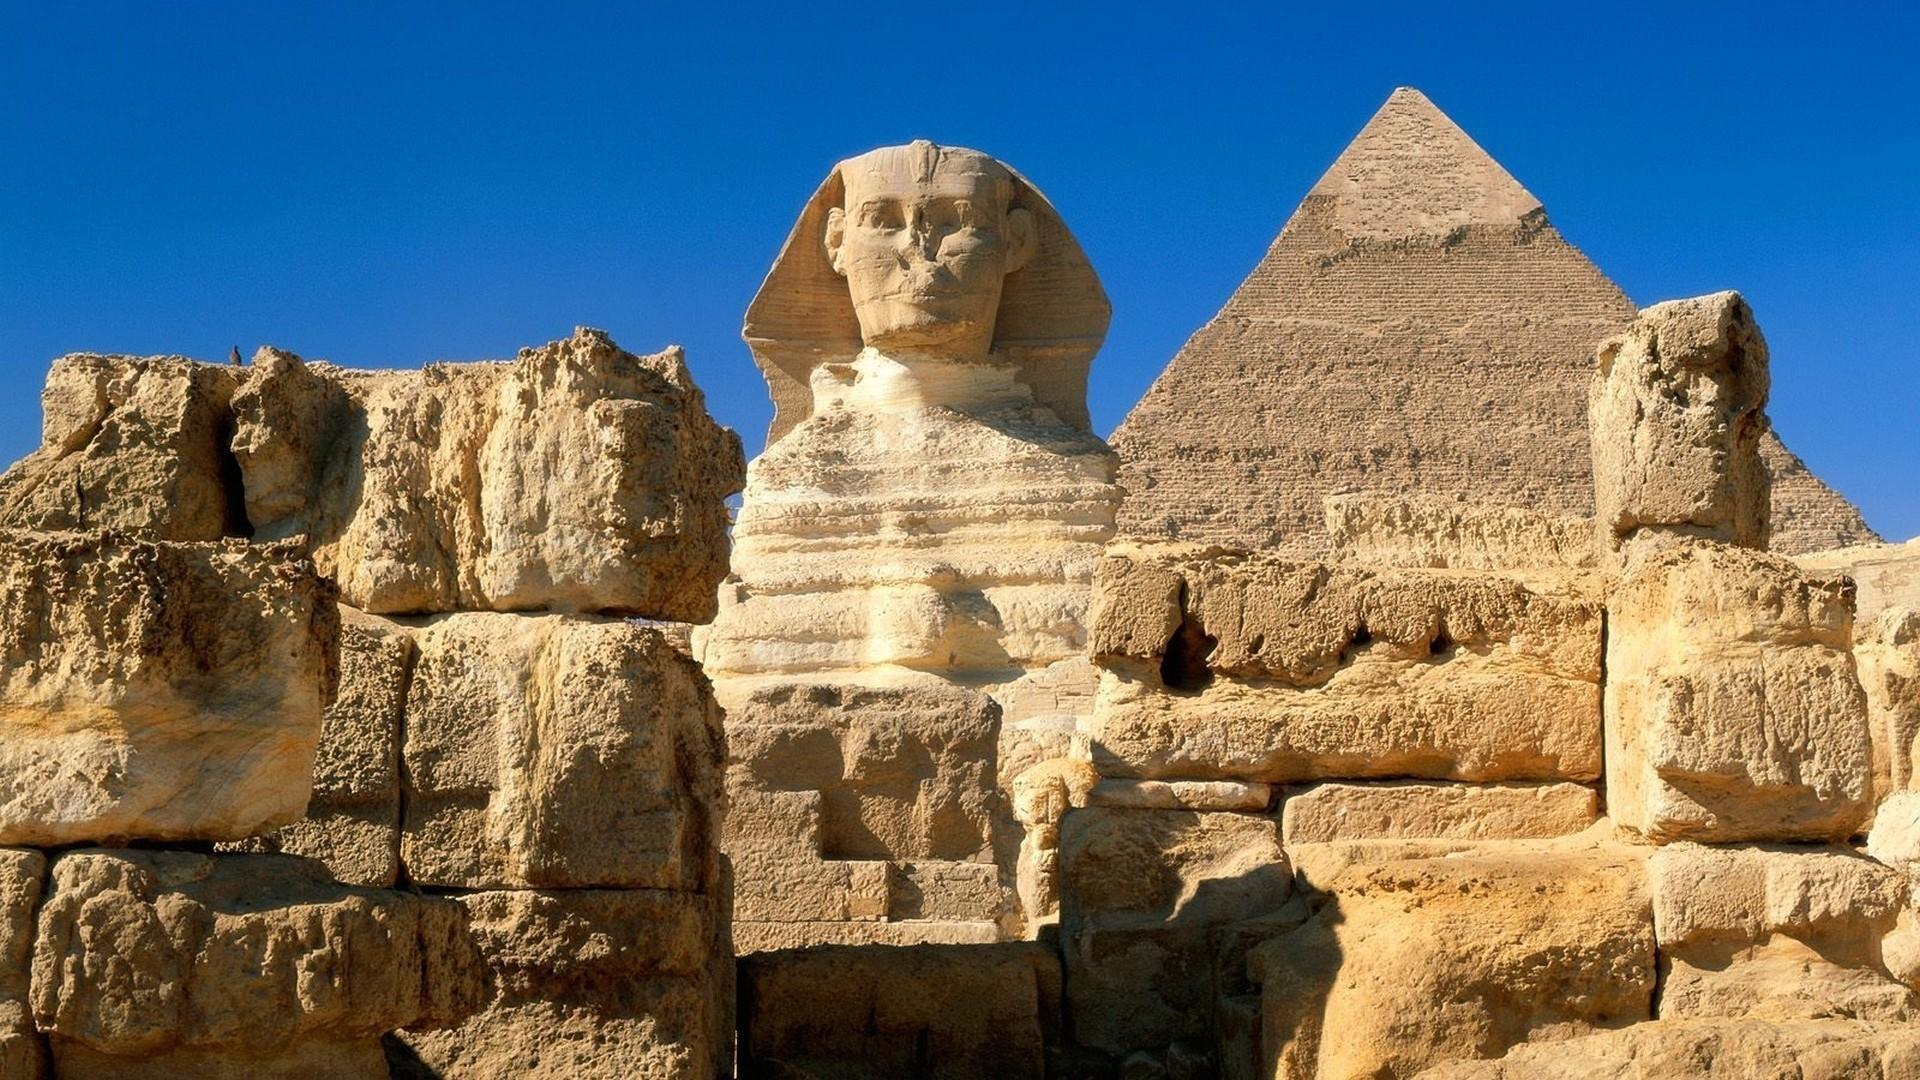 Egypt wallpaper photo hd